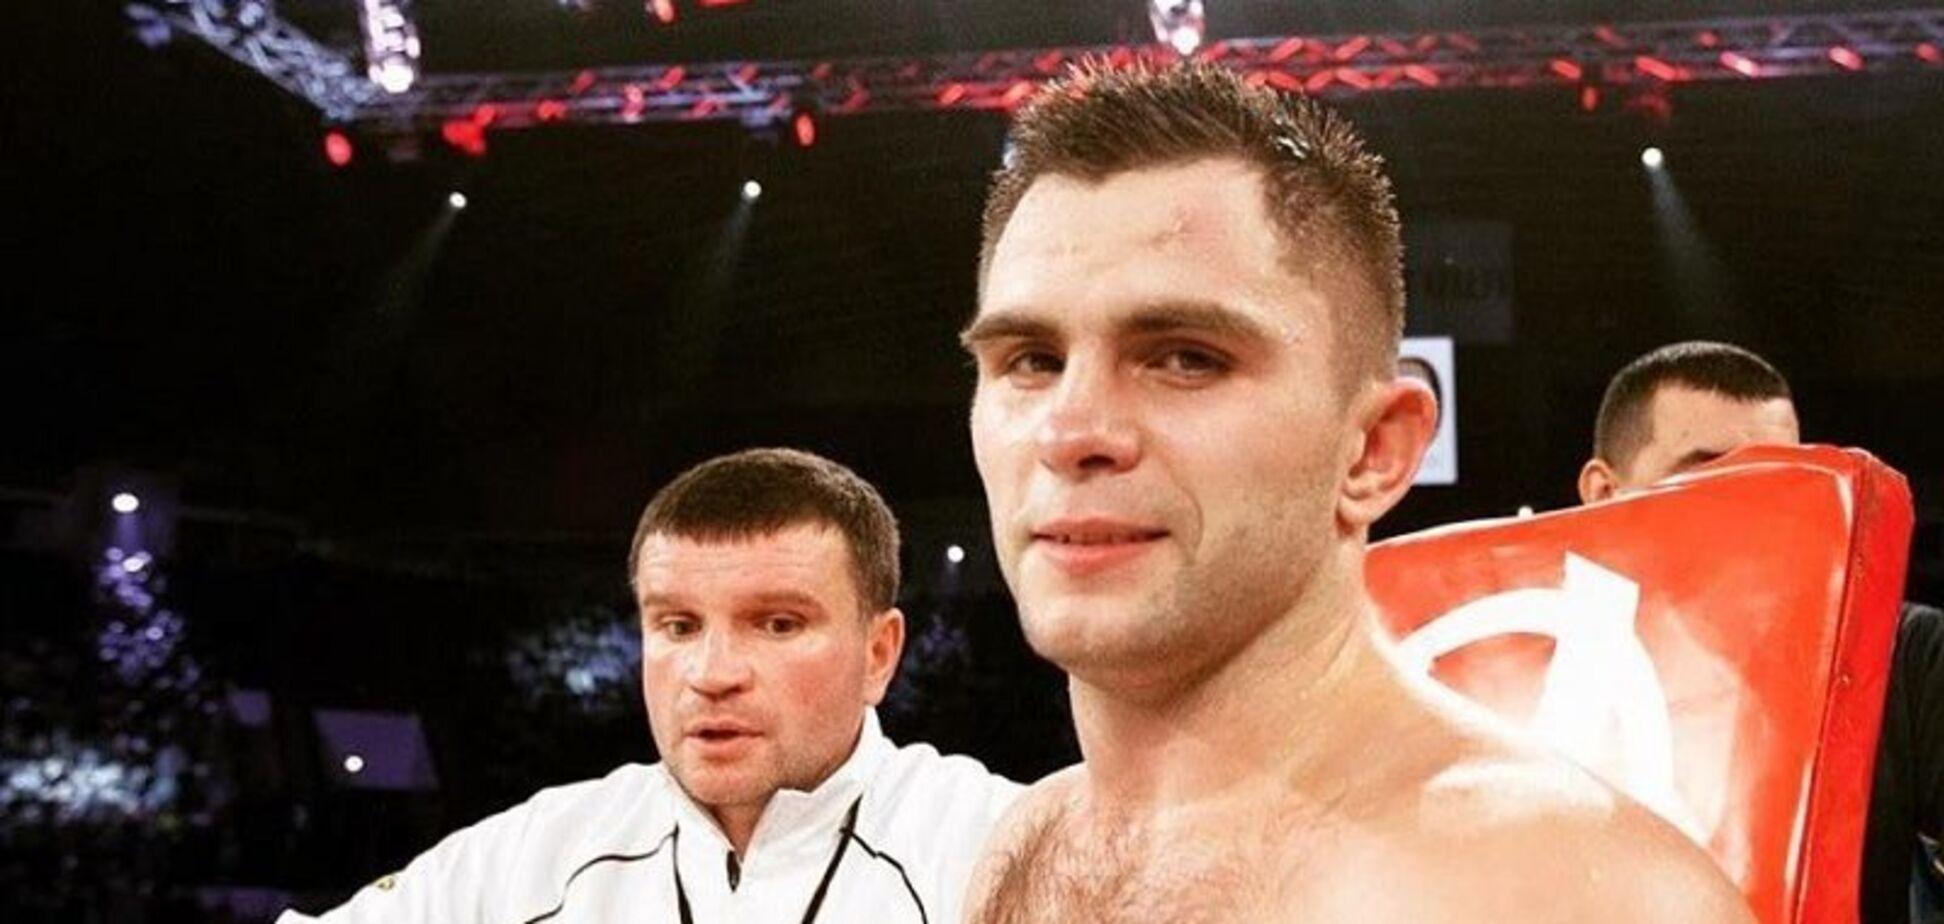 Бій знаменитого українського боксера в андеркарті Усик - Белью завершився незвичайним результатом